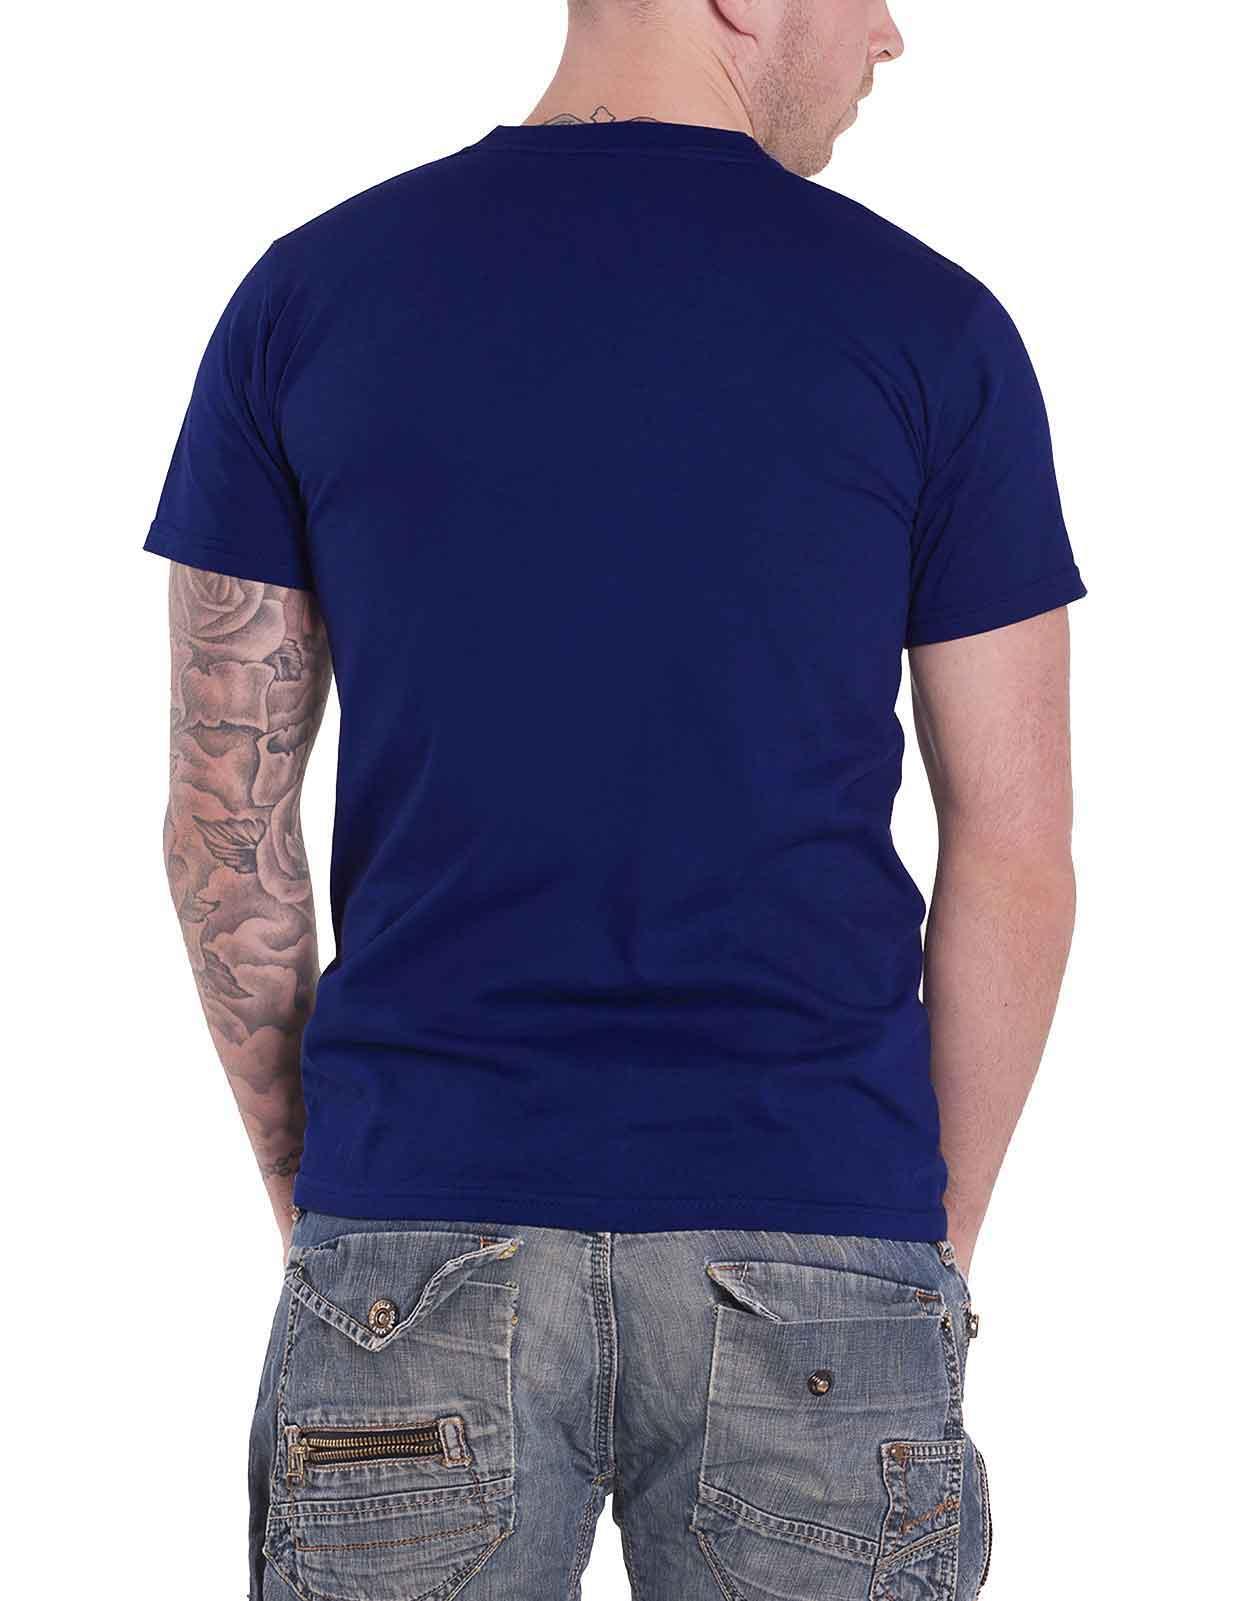 Officiel-Harry-Potter-T-Shirt-Poudlard-Gryffondor-Poufsouffle-cretes-Homme-NEUF miniature 45